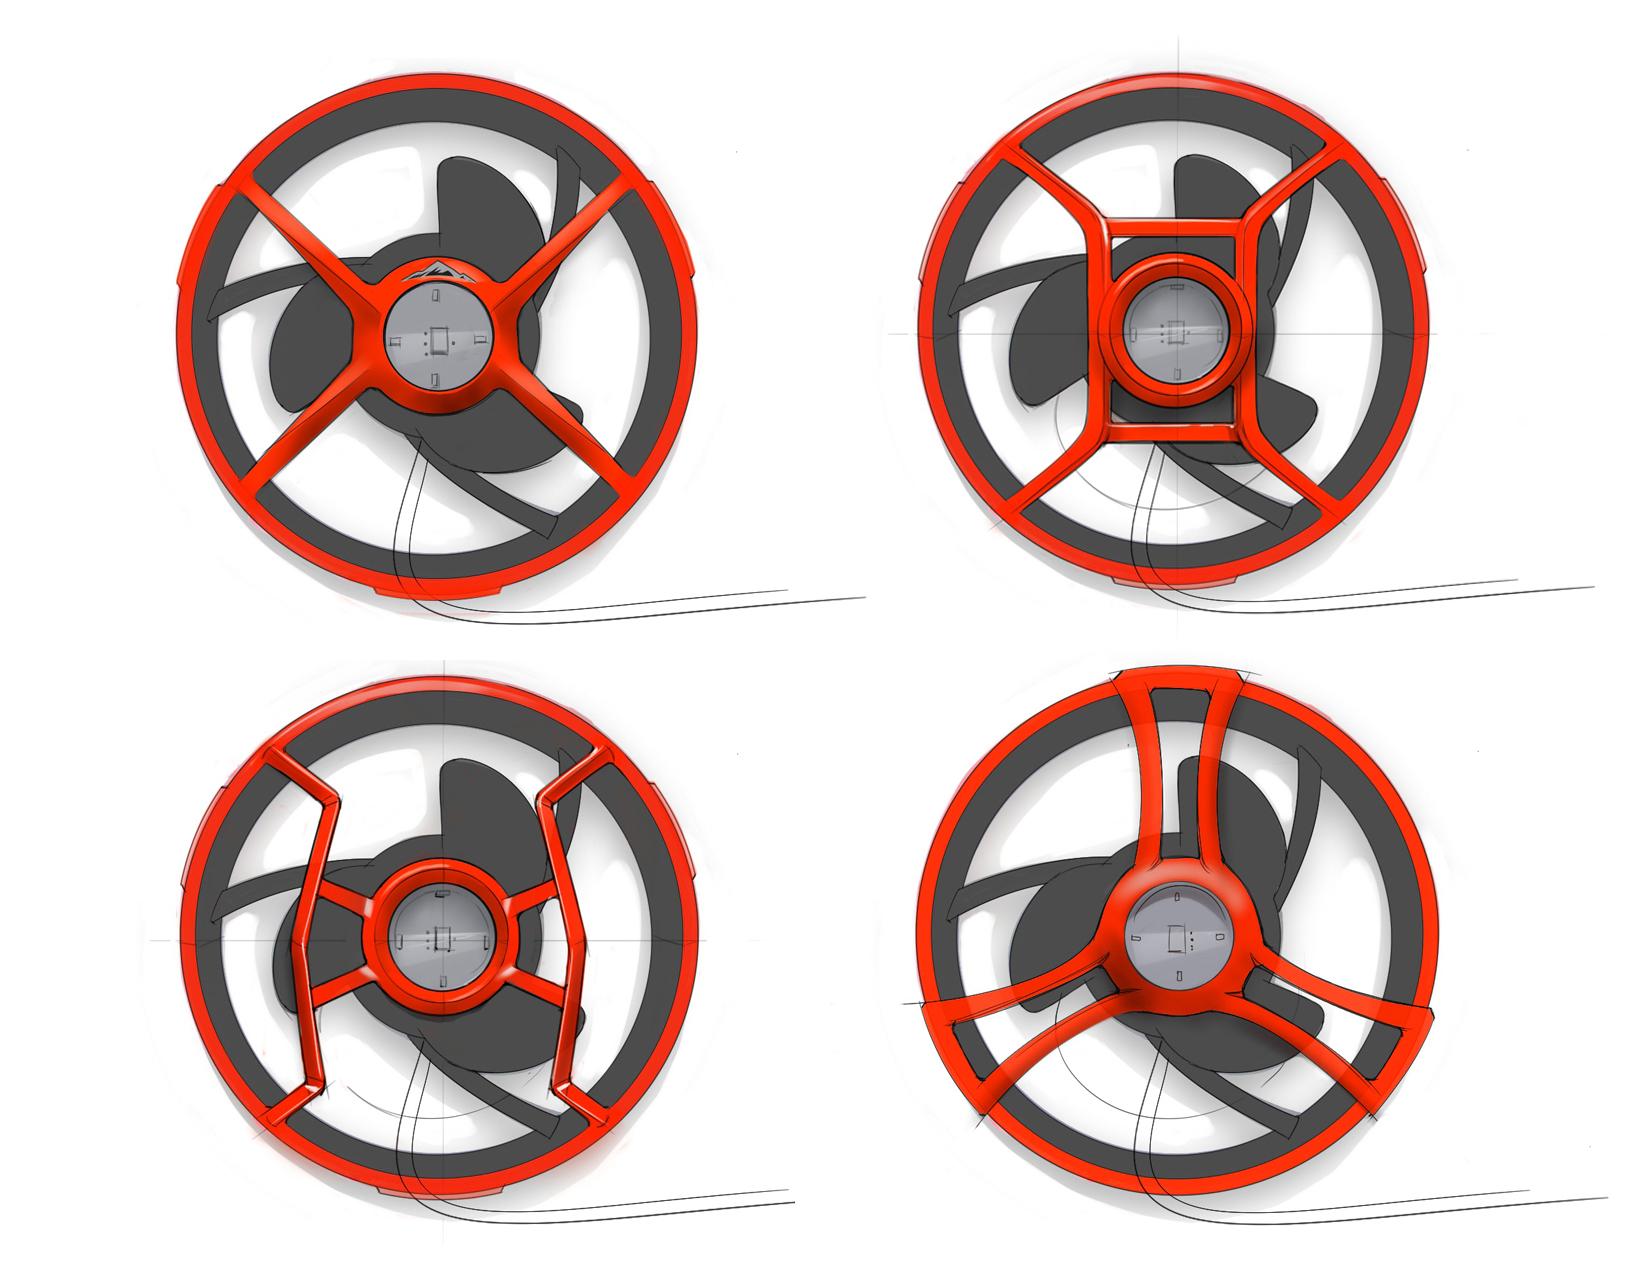 heatersketches154-1.jpg